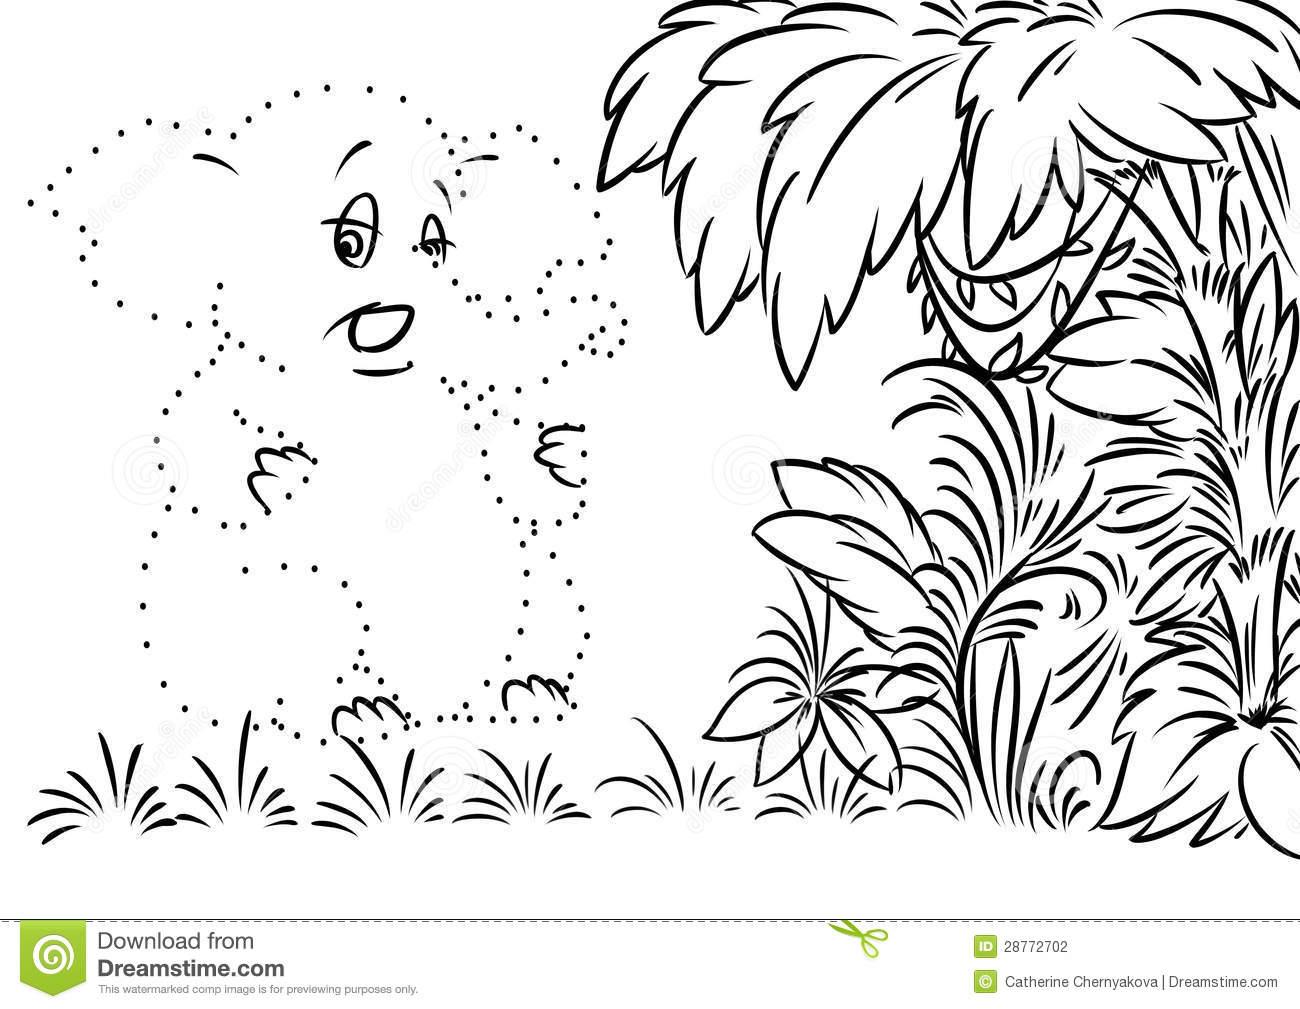 Jungle coloring #13, Download drawings